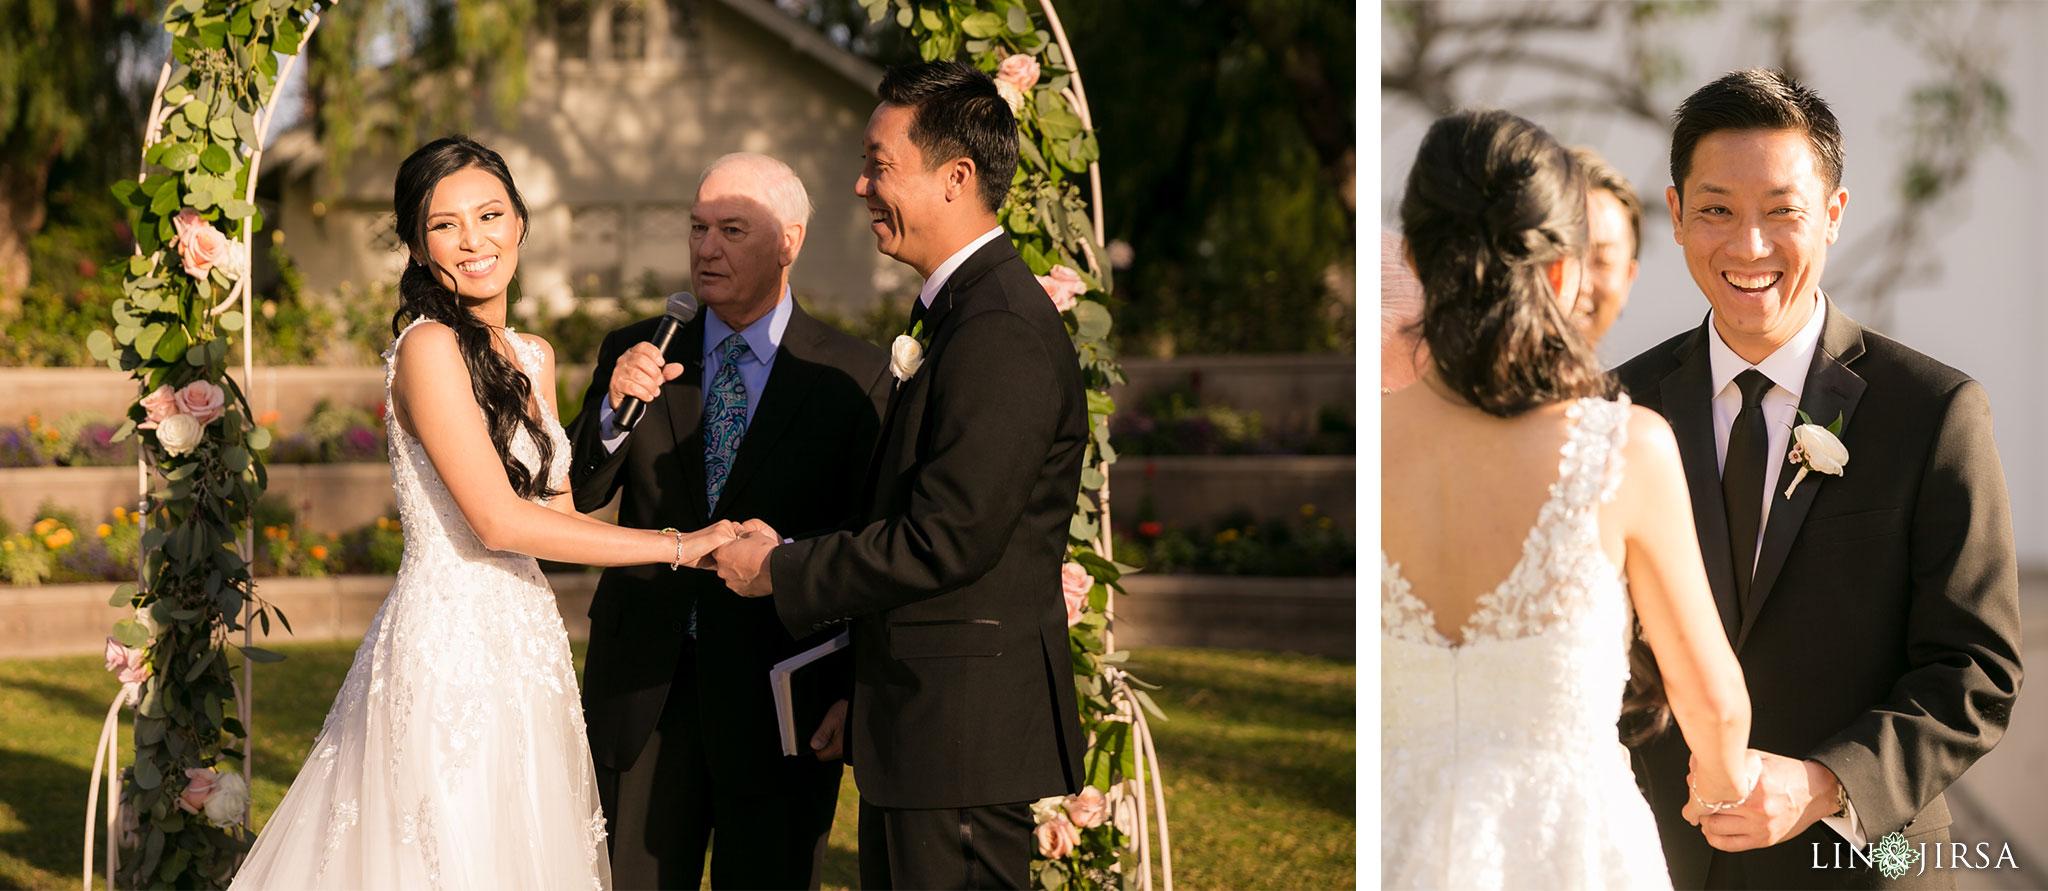 17 richard nixon library wedding ceremony photography